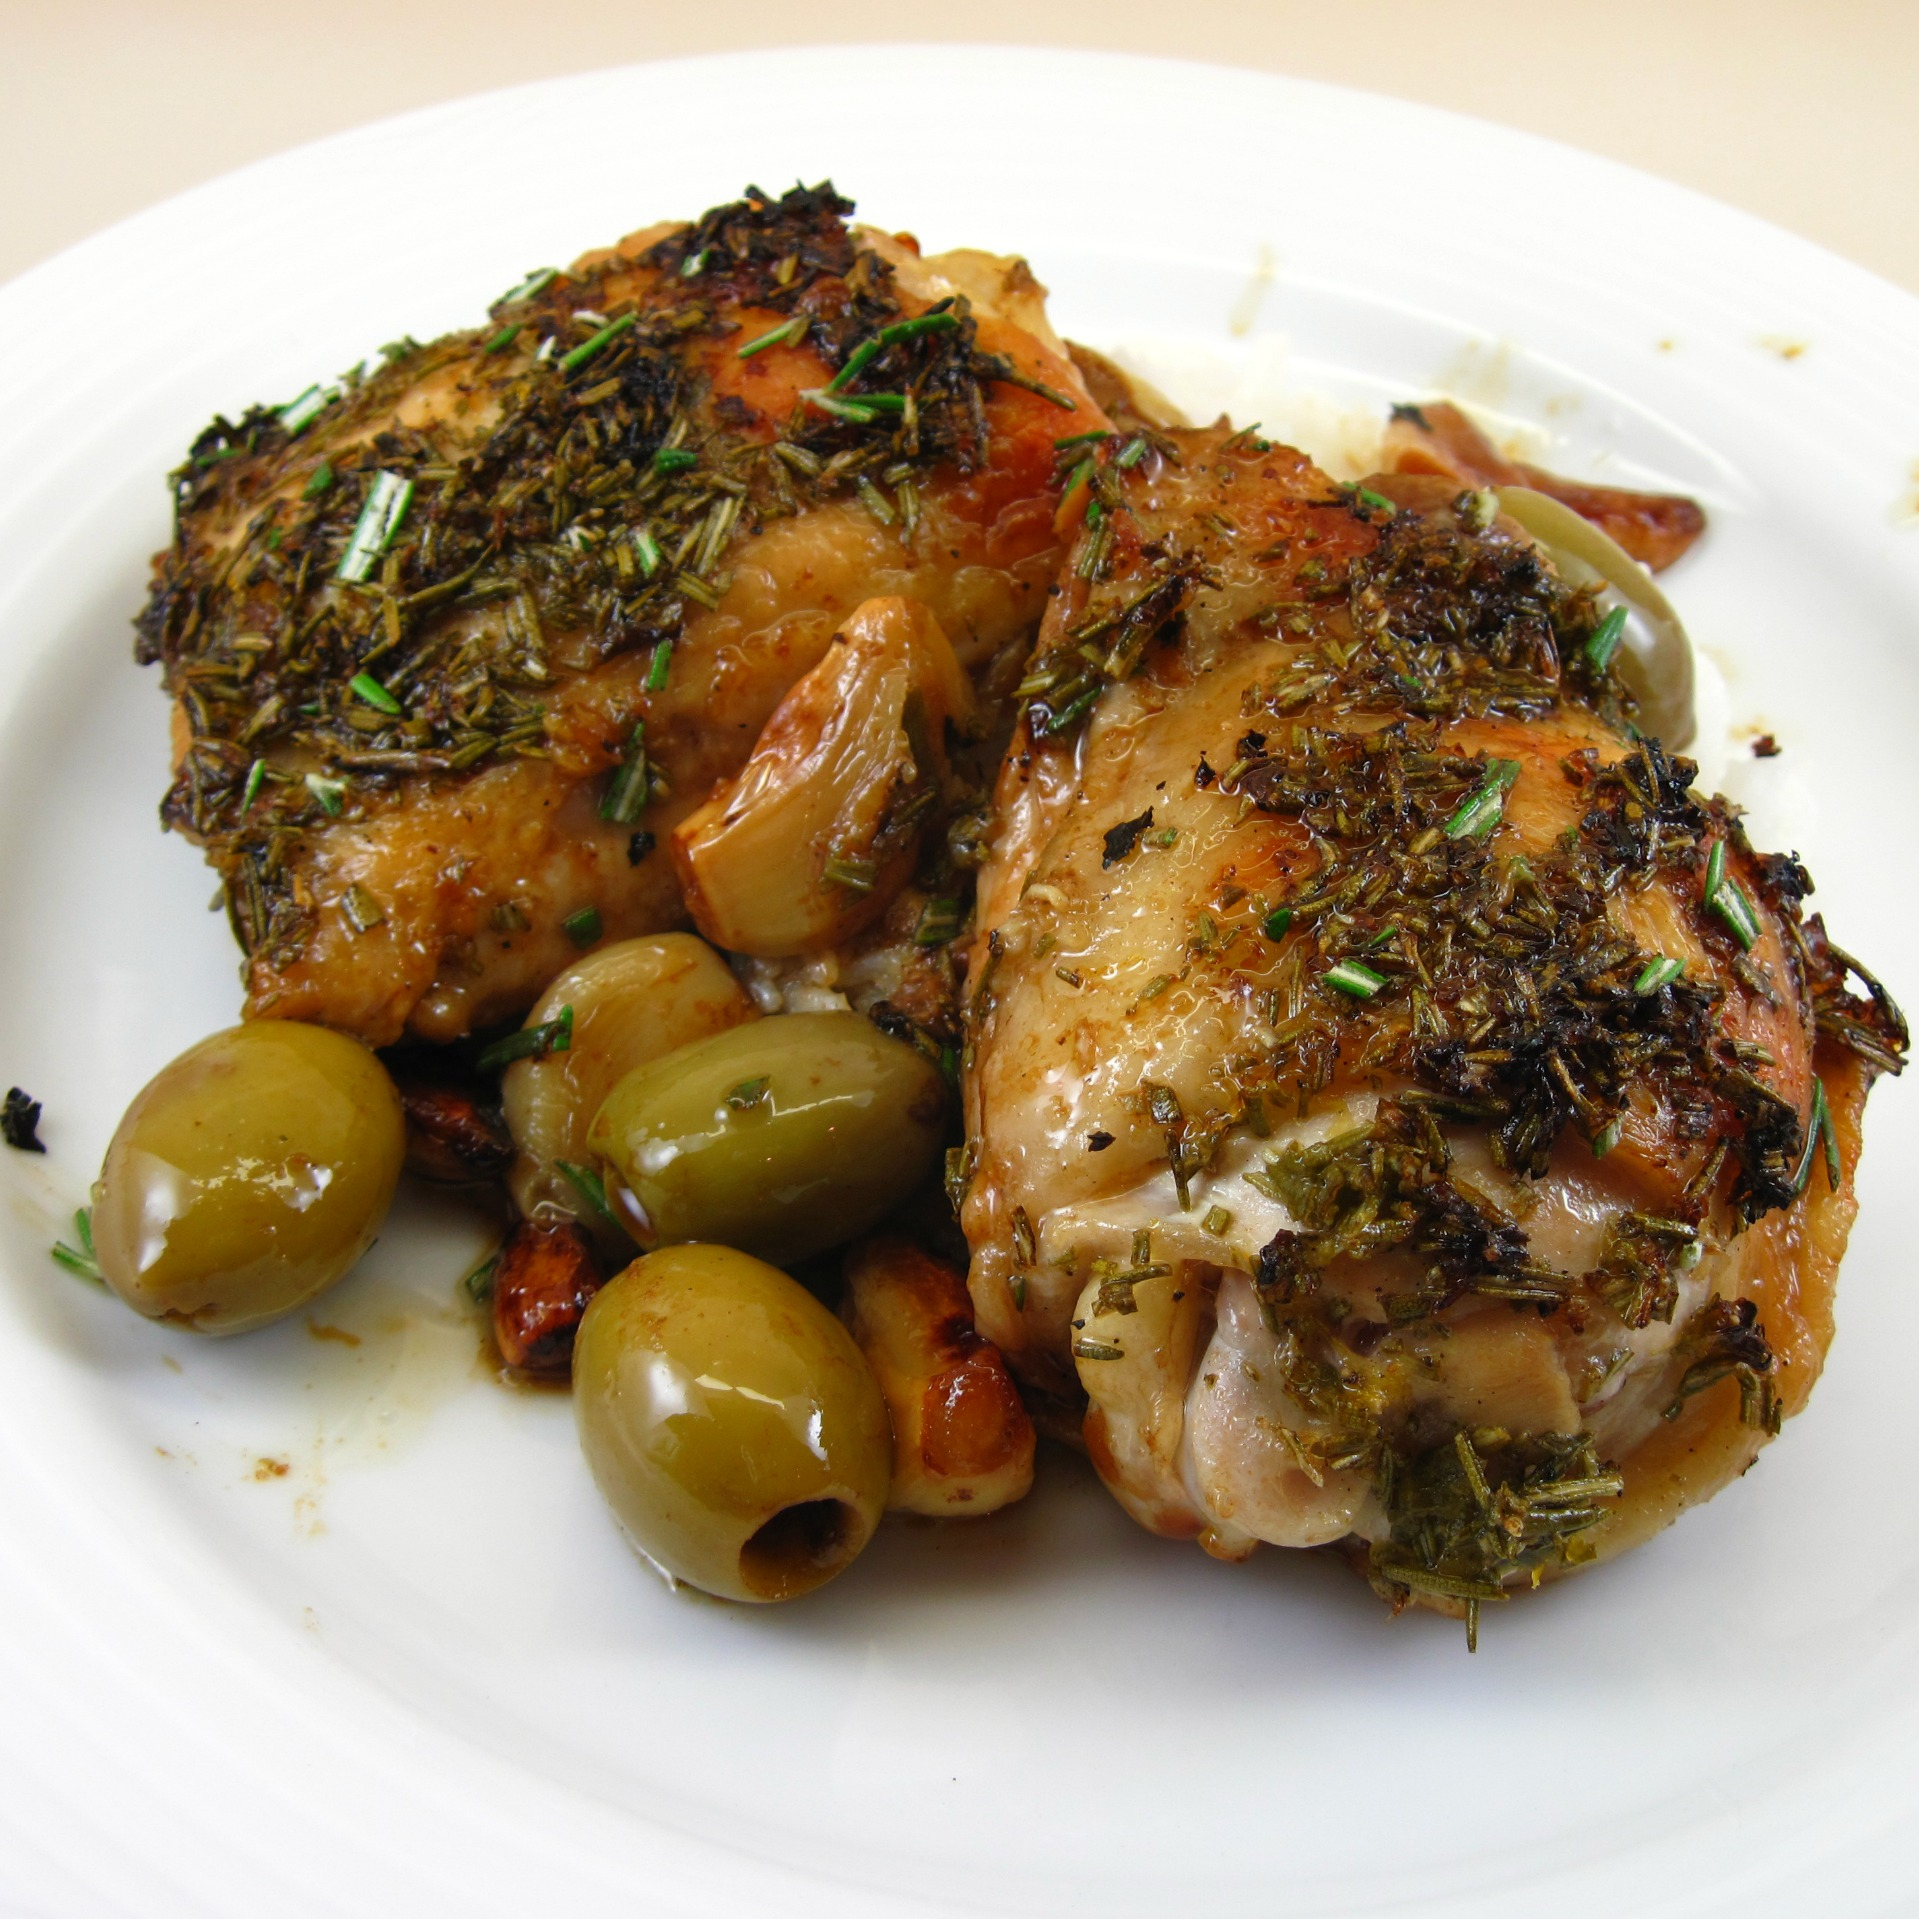 Roast Lemon-Garlic Chicken With Green Olives